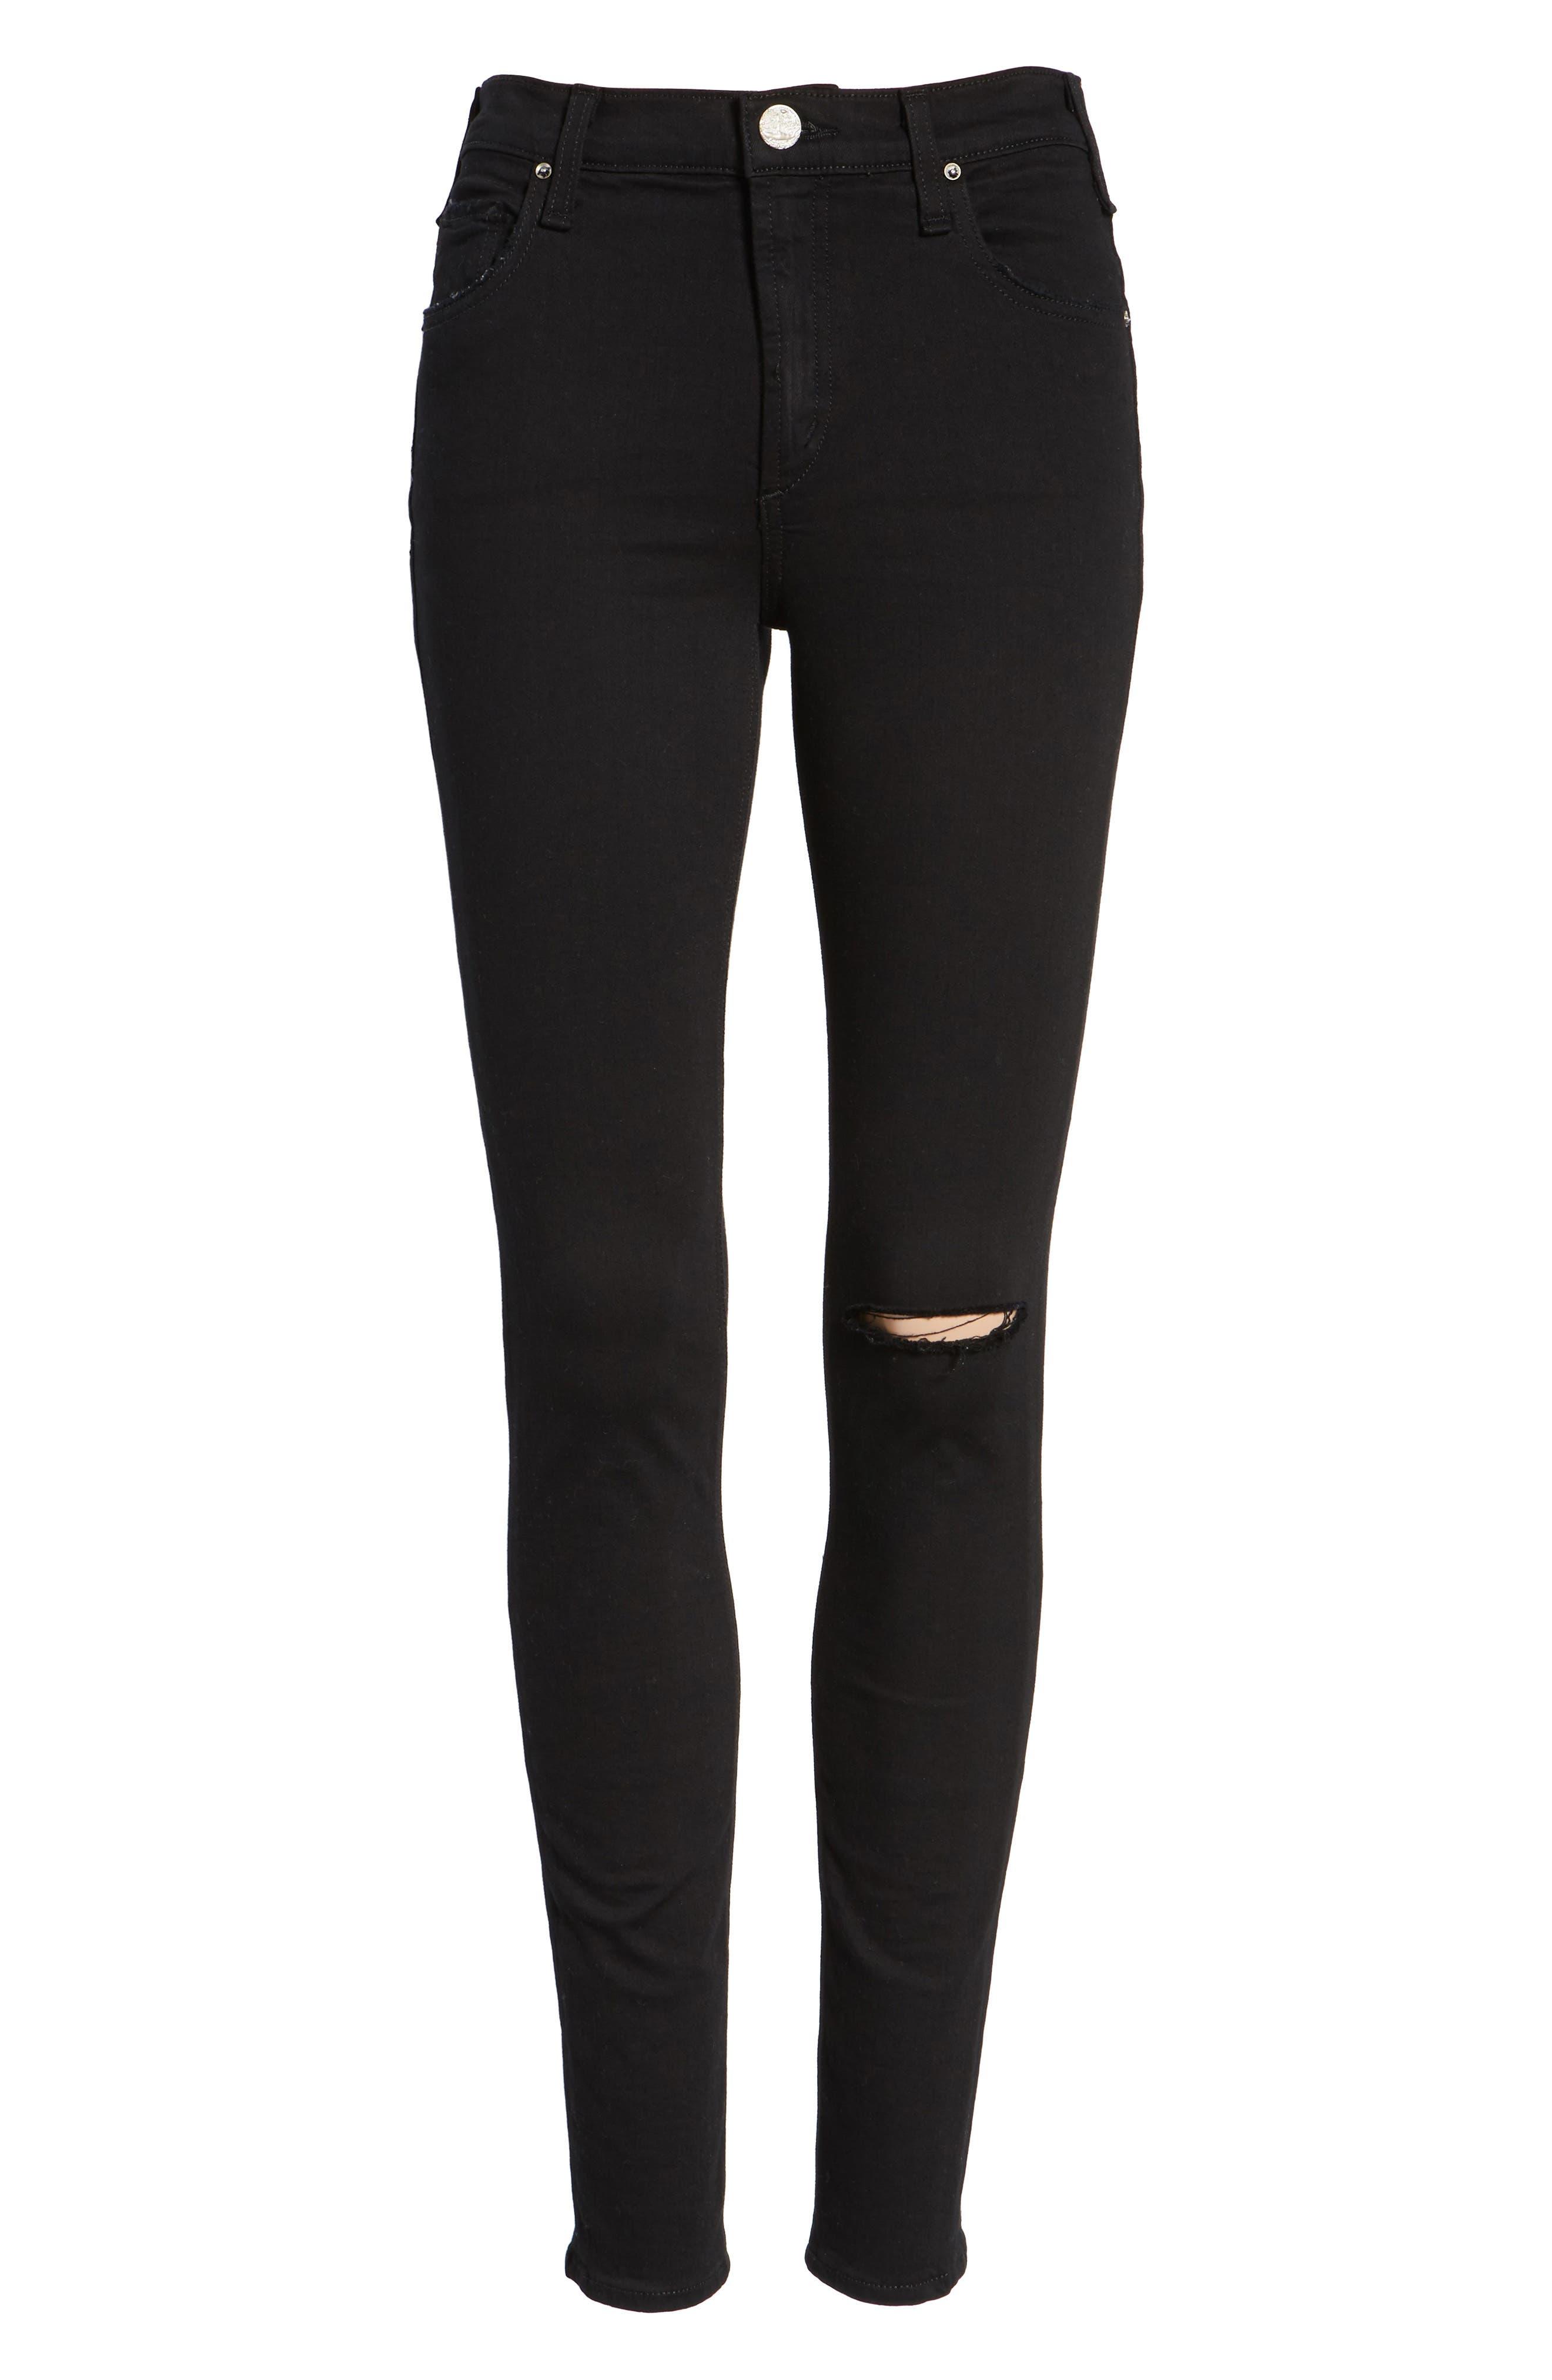 Newton High Waist Ankle Skinny Jeans,                             Alternate thumbnail 6, color,                             001